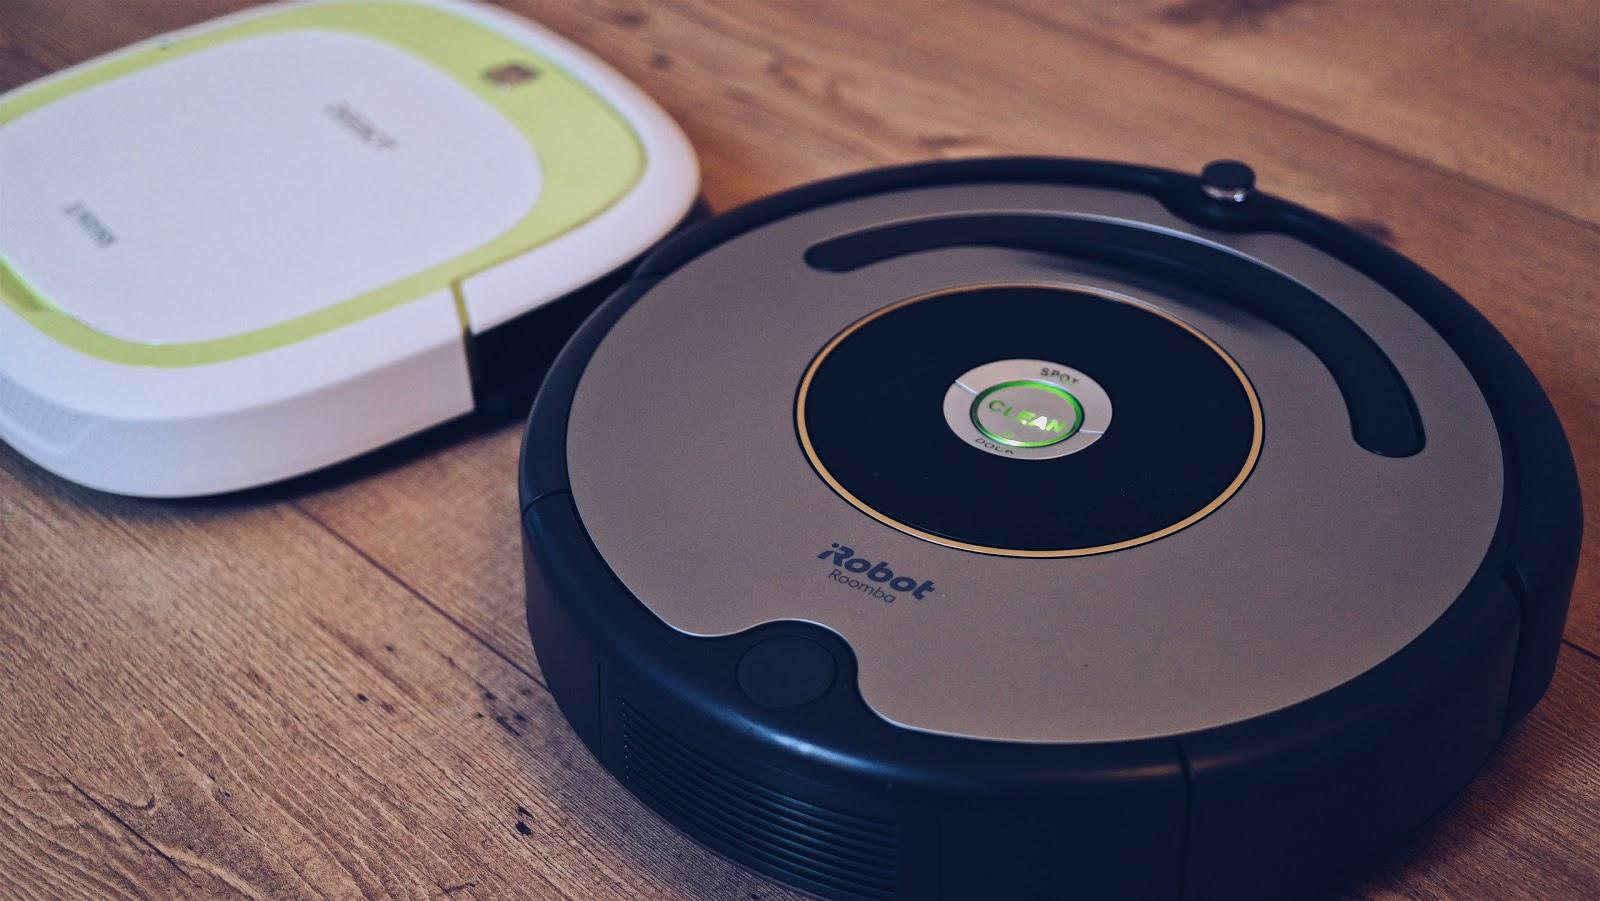 Robot Wars: iRobot Roomba 616 vs. EcoVacs DeeBot Slim | Wer wird demnächst in meinem Büro fahren